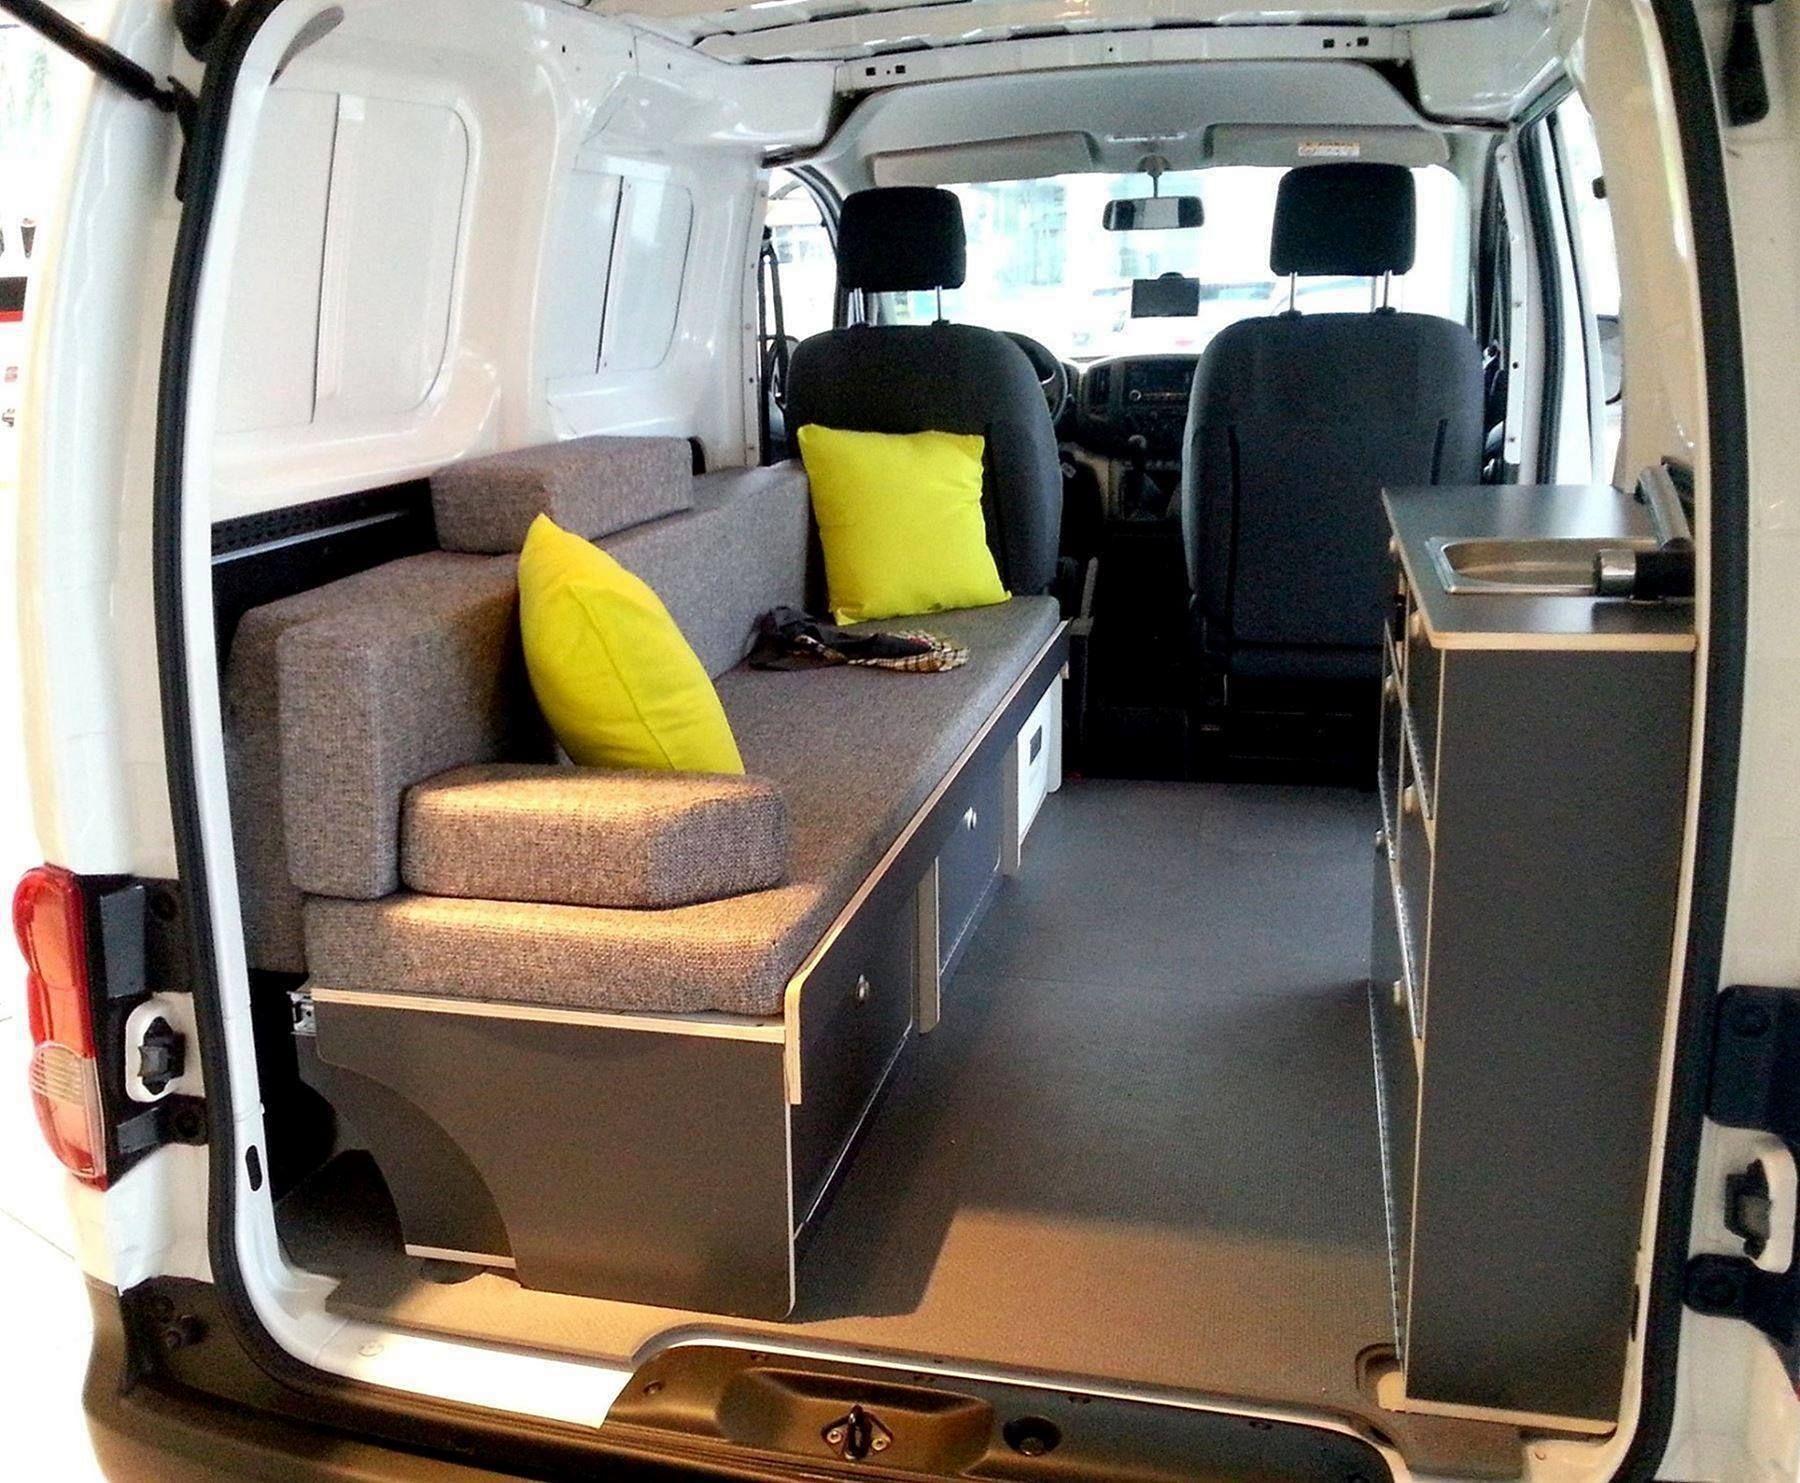 Marvelous 25 Wonderful Small Rv And Camper Van Interiors Design